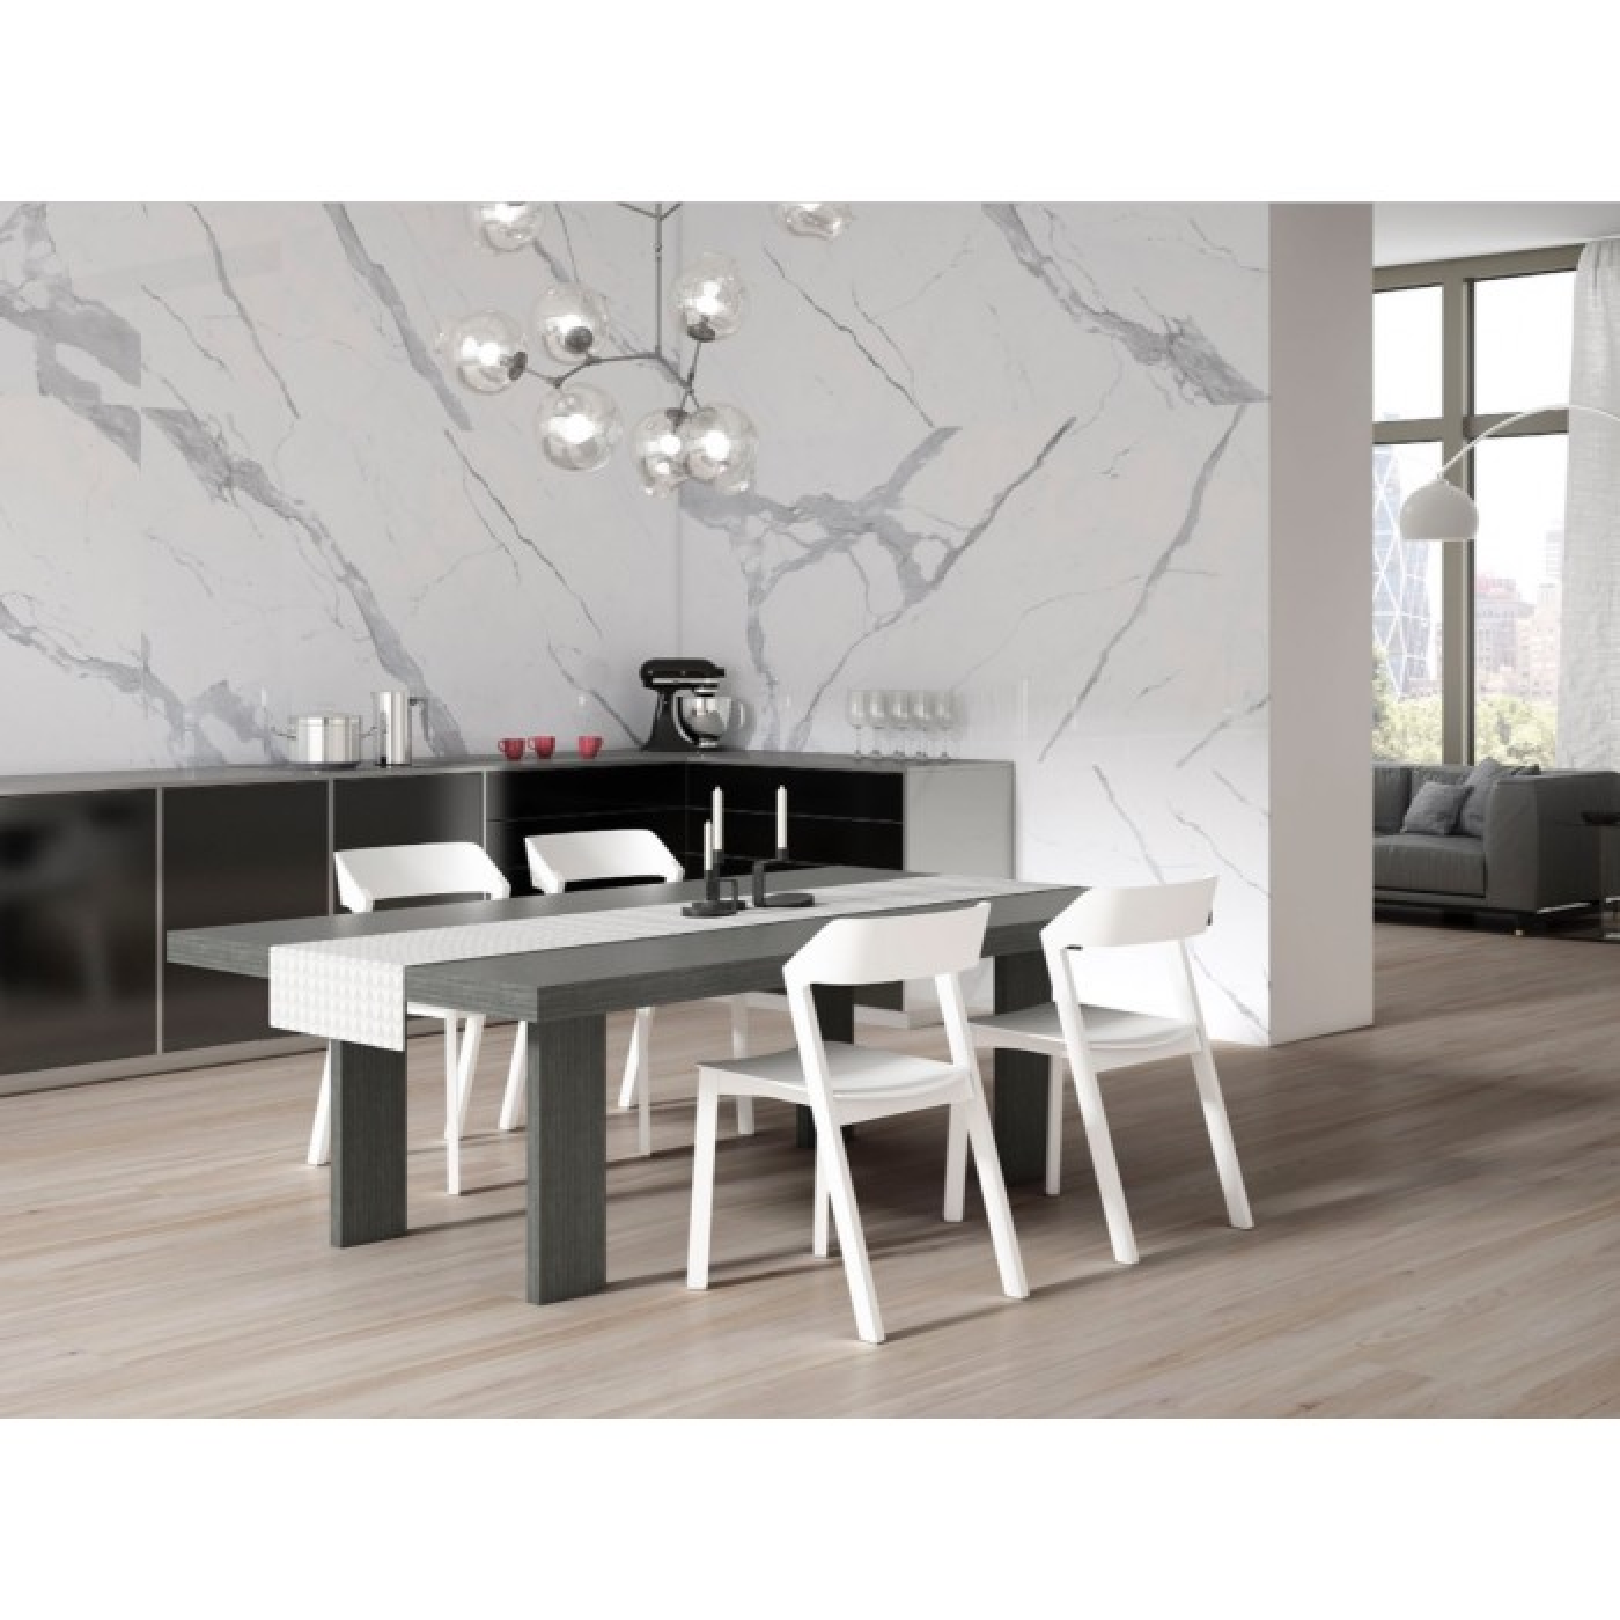 Carrelage grès cérame effet marbre Statuary Extra White, rectifié